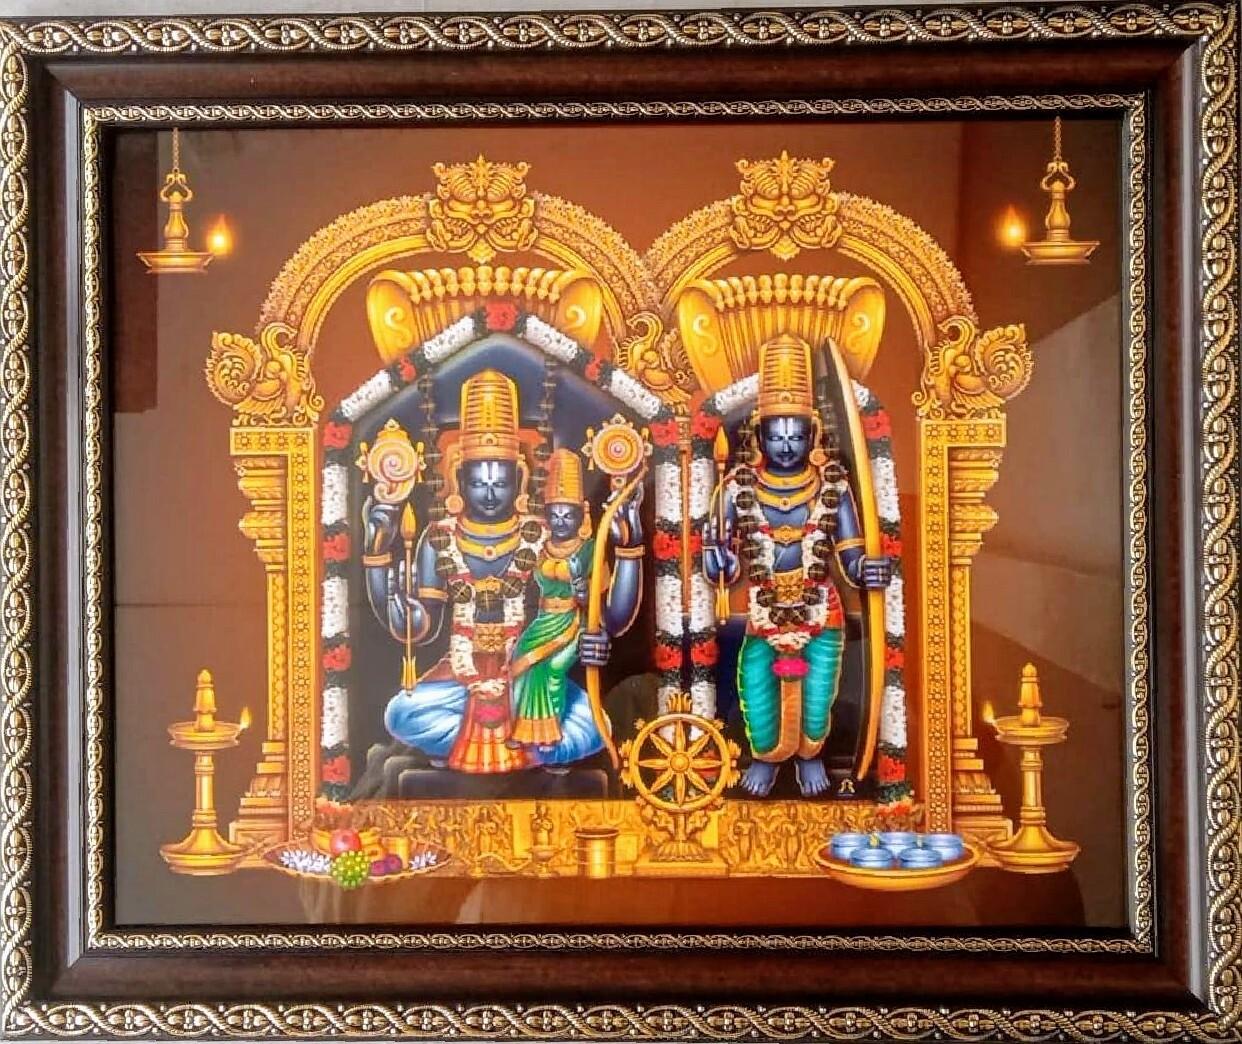 Sri Sita Ramachandra Swamy (Bhadrachalam Temple) Photo Frame